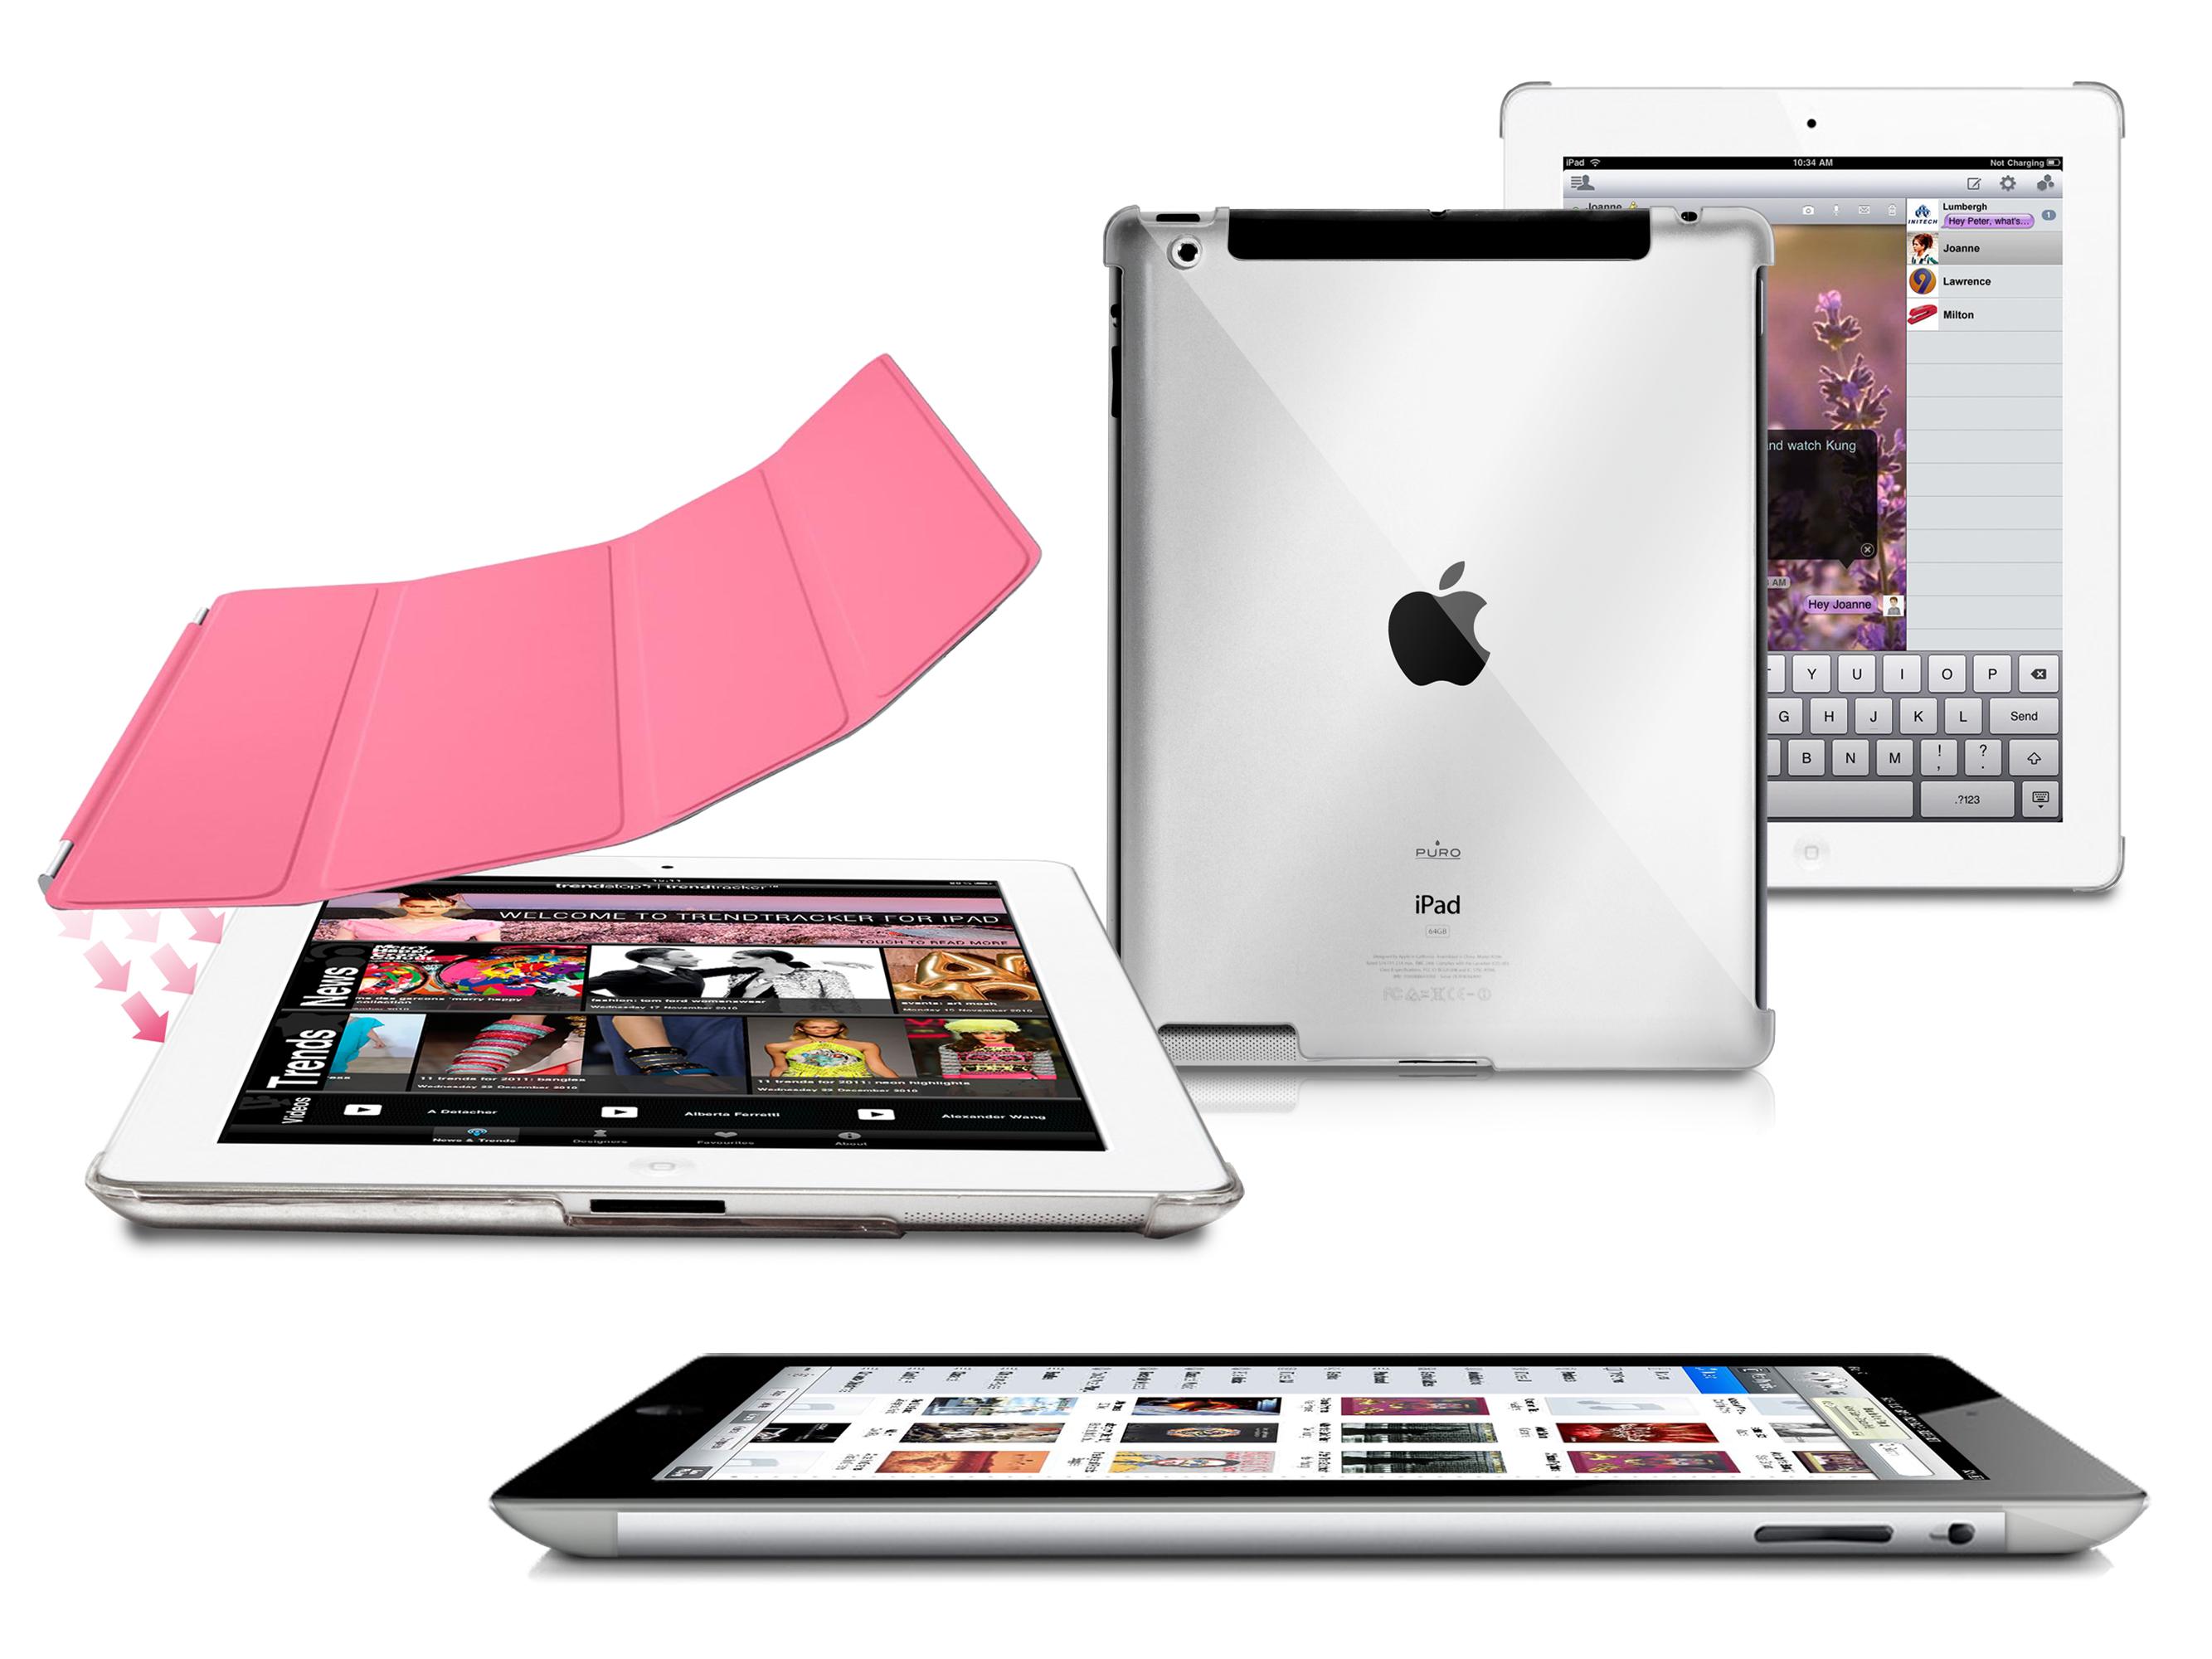 Nuova linea custodie iPad 2 da Puro